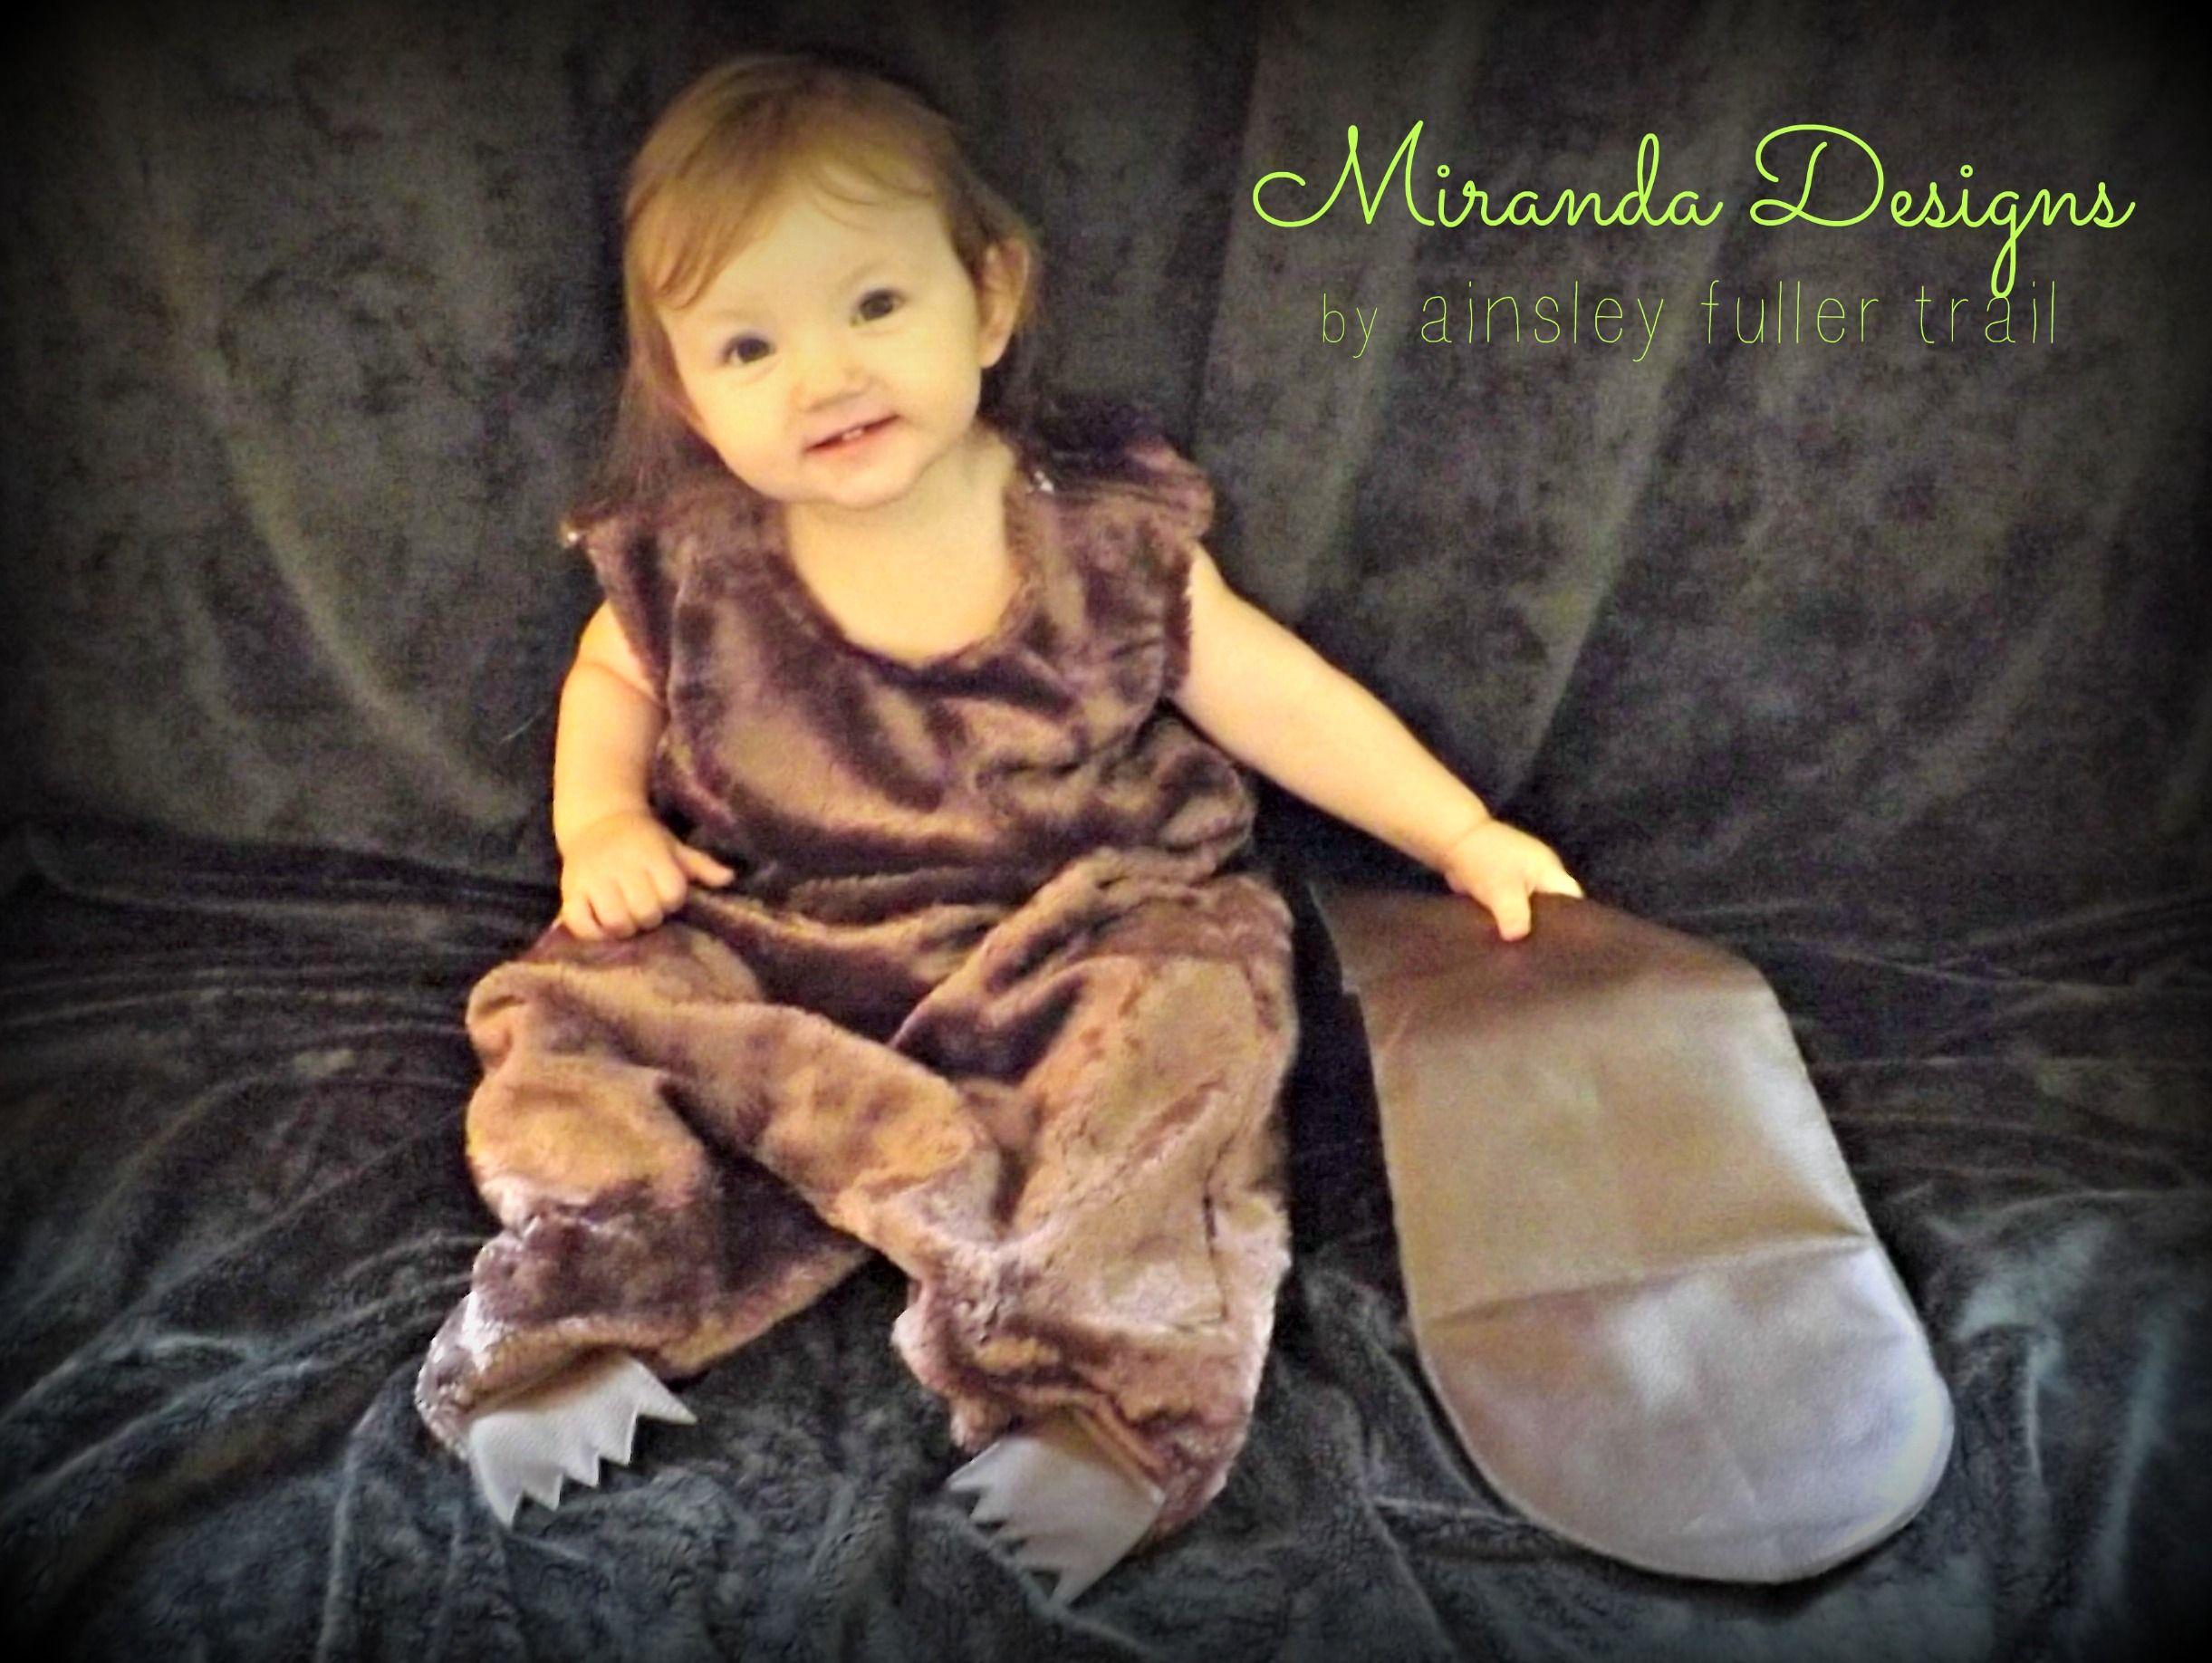 Itu0027s Halloweu0027en Baby! Beaver costume  sc 1 st  Pinterest & Itu0027s Halloweu0027en Baby! Beaver costume | Miranda Designs ...